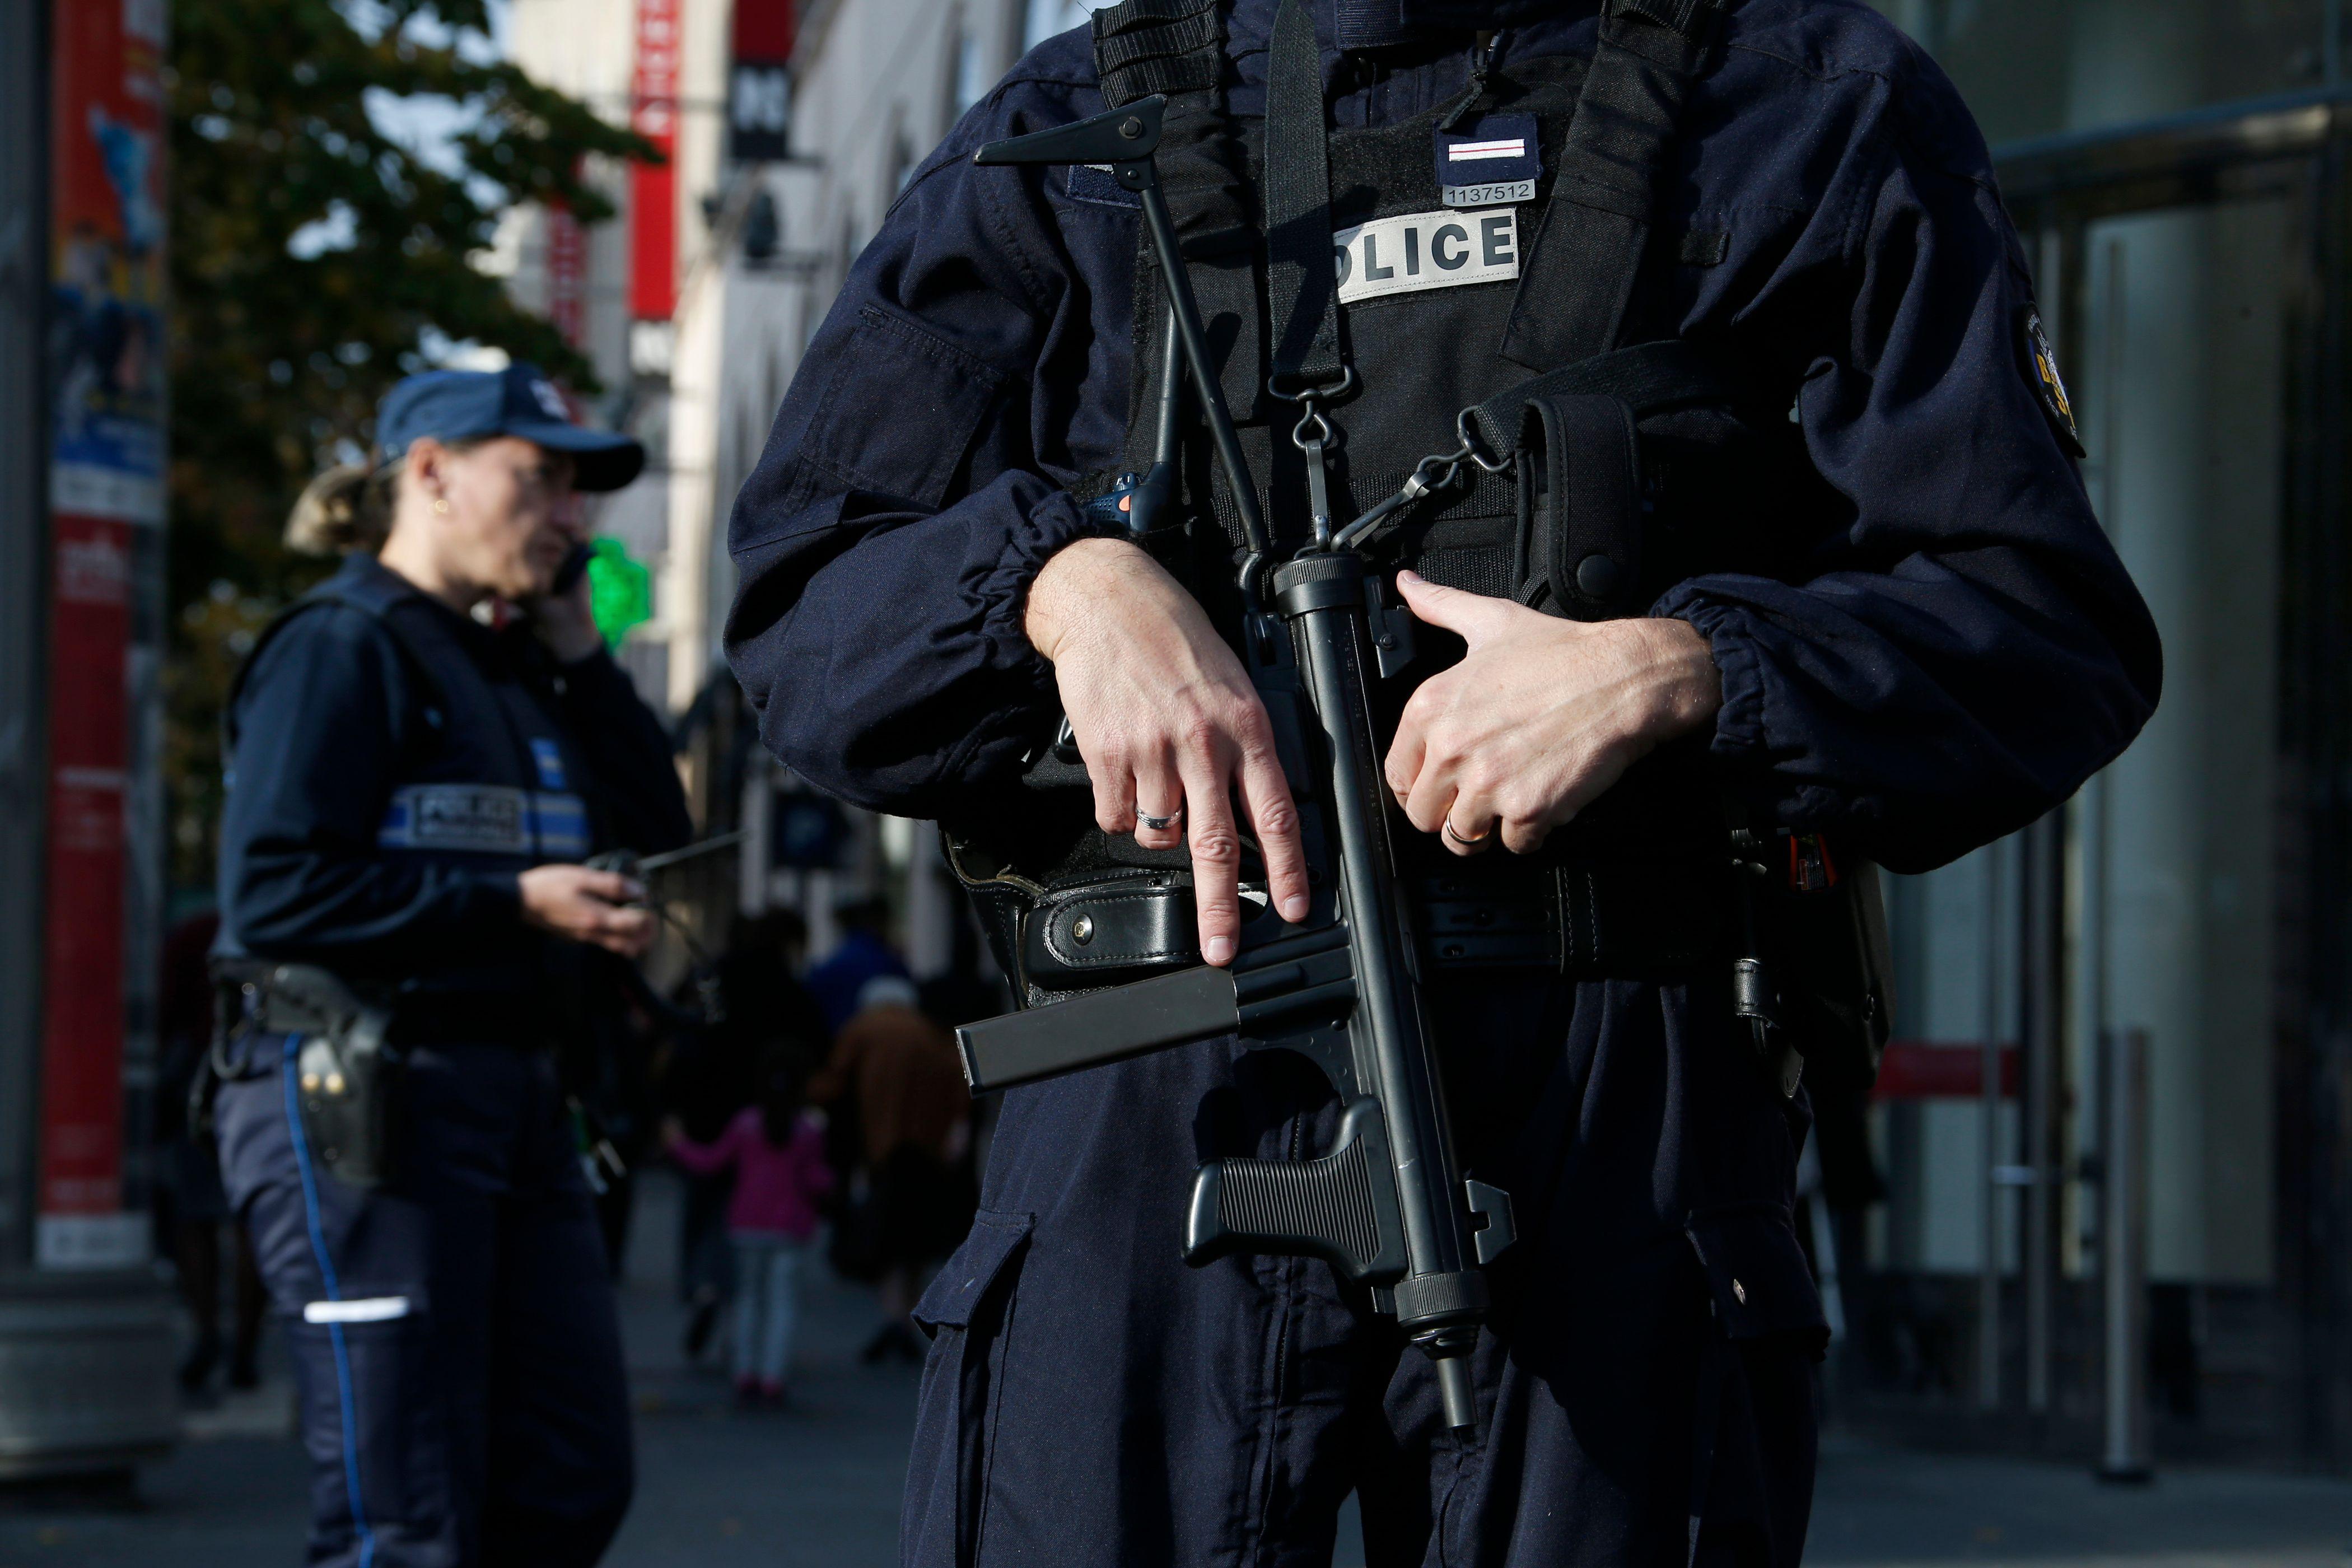 Attentats de Paris : 1 233 perquisitions, 165 interpellations et 230 armes saisies depuis l'entrée en vigueur de l'état d'urgence